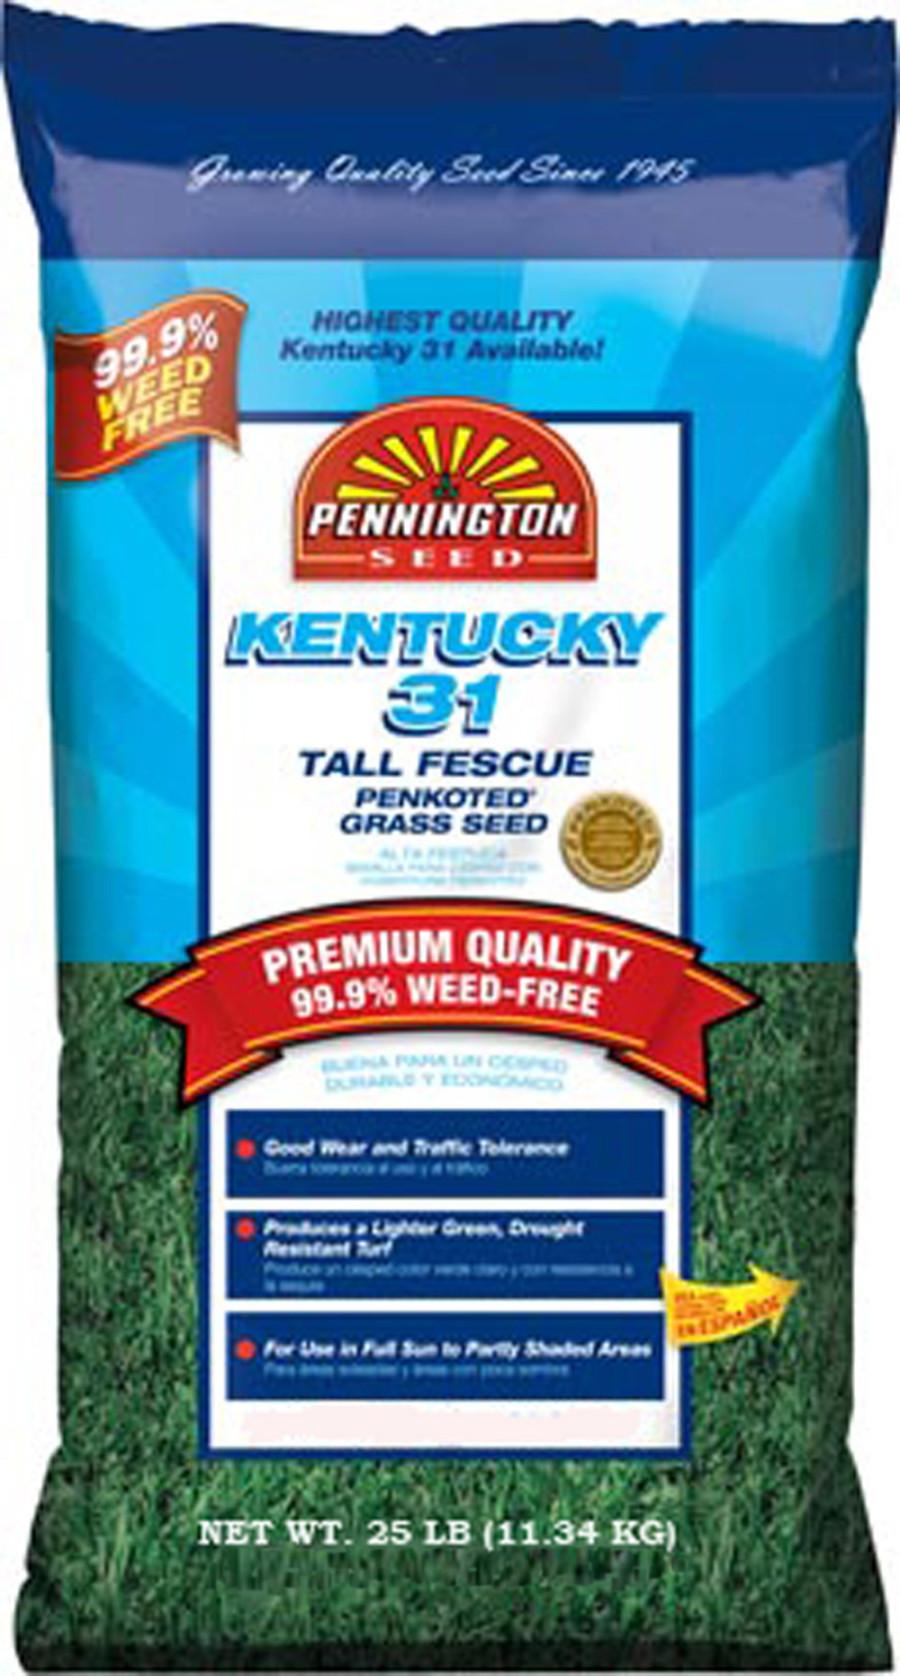 Pennington Kentucky 31 Tall Fescue Penkoted Grass Seed 1ea/20 lb